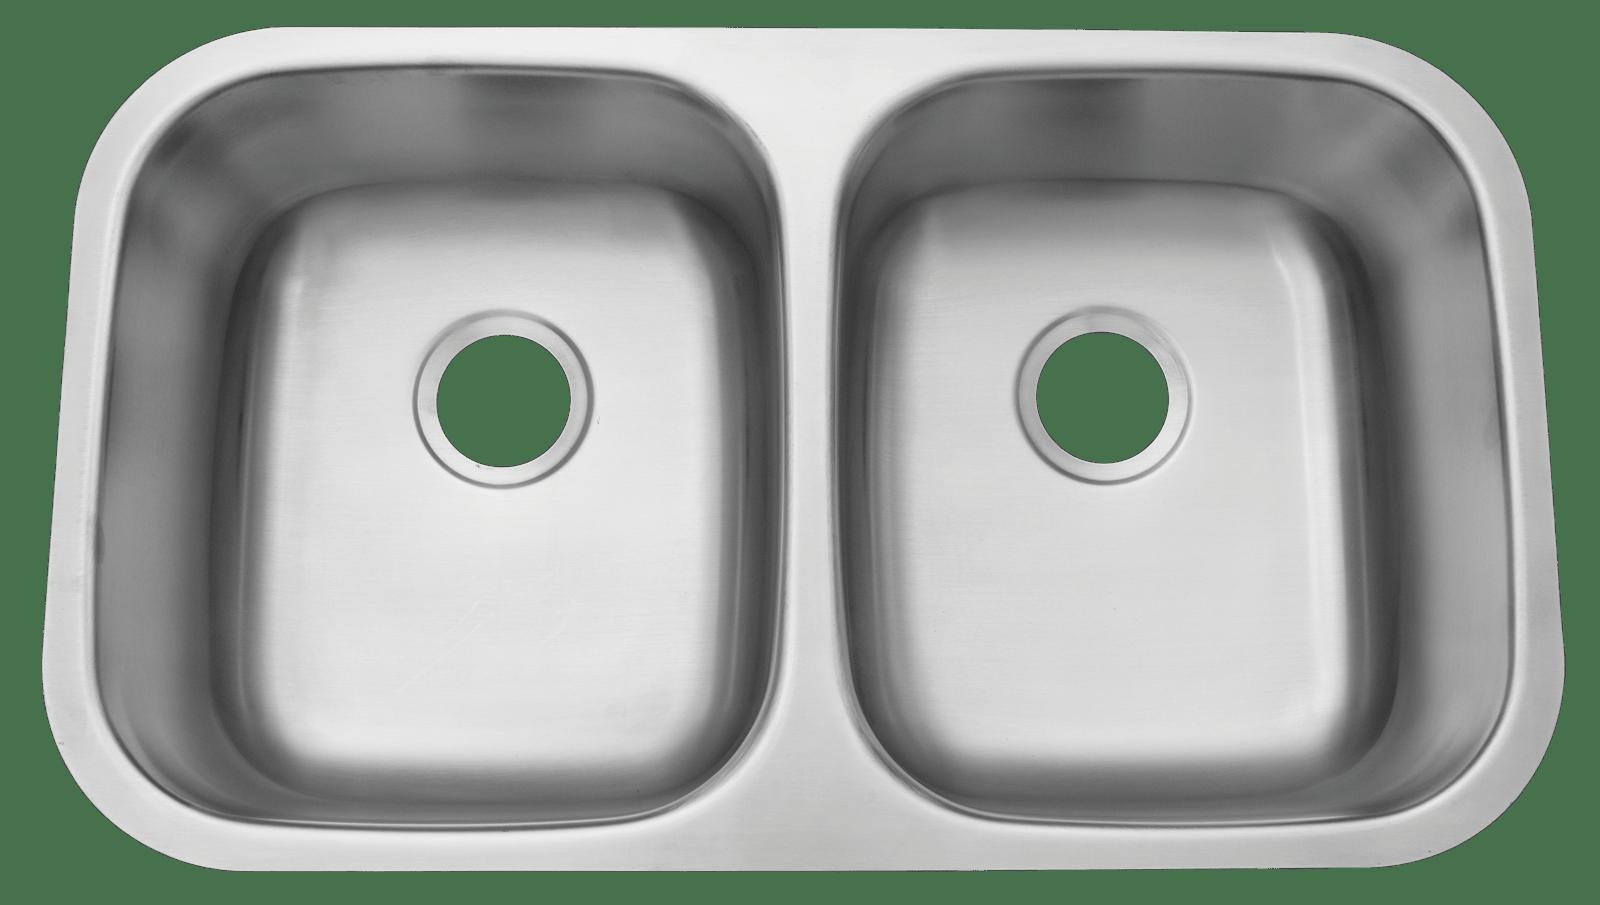 ada compliant 20 gauge stainless steel undermount sink 50 50 double bowl blue pearl stone